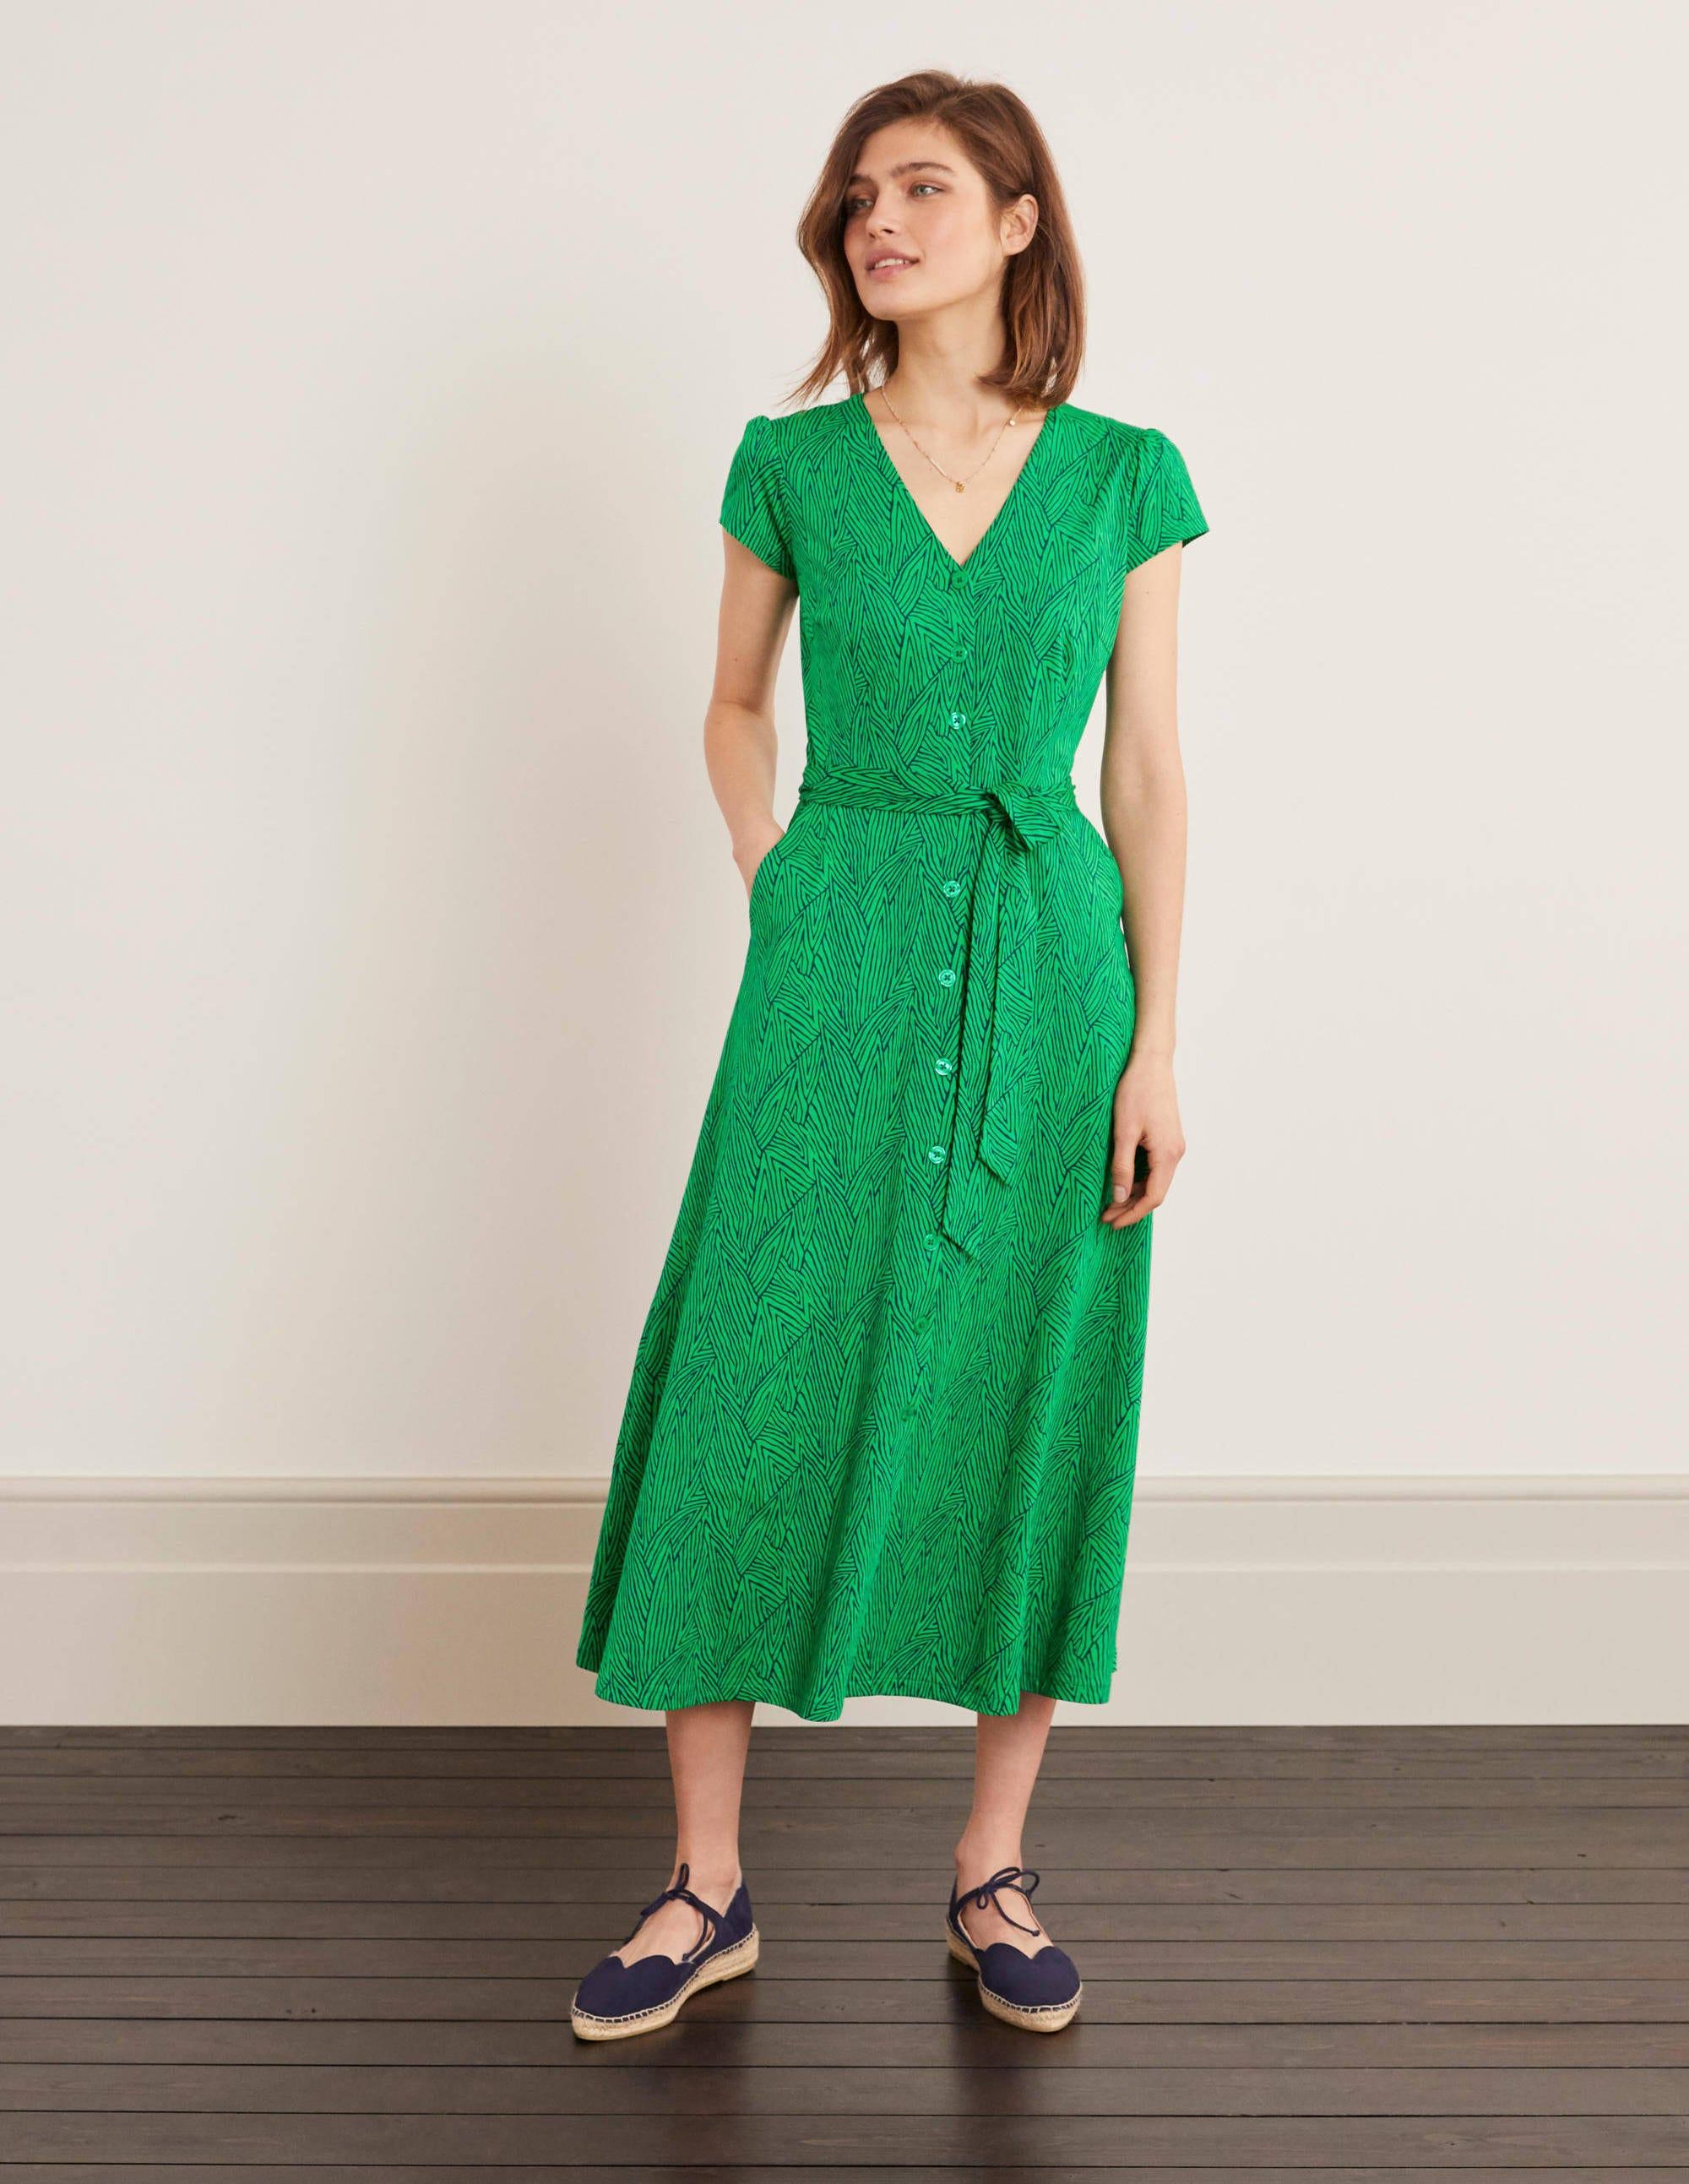 Frances Midikleid aus Jersey - Sattes Smaragdgrün, Tropenblatt